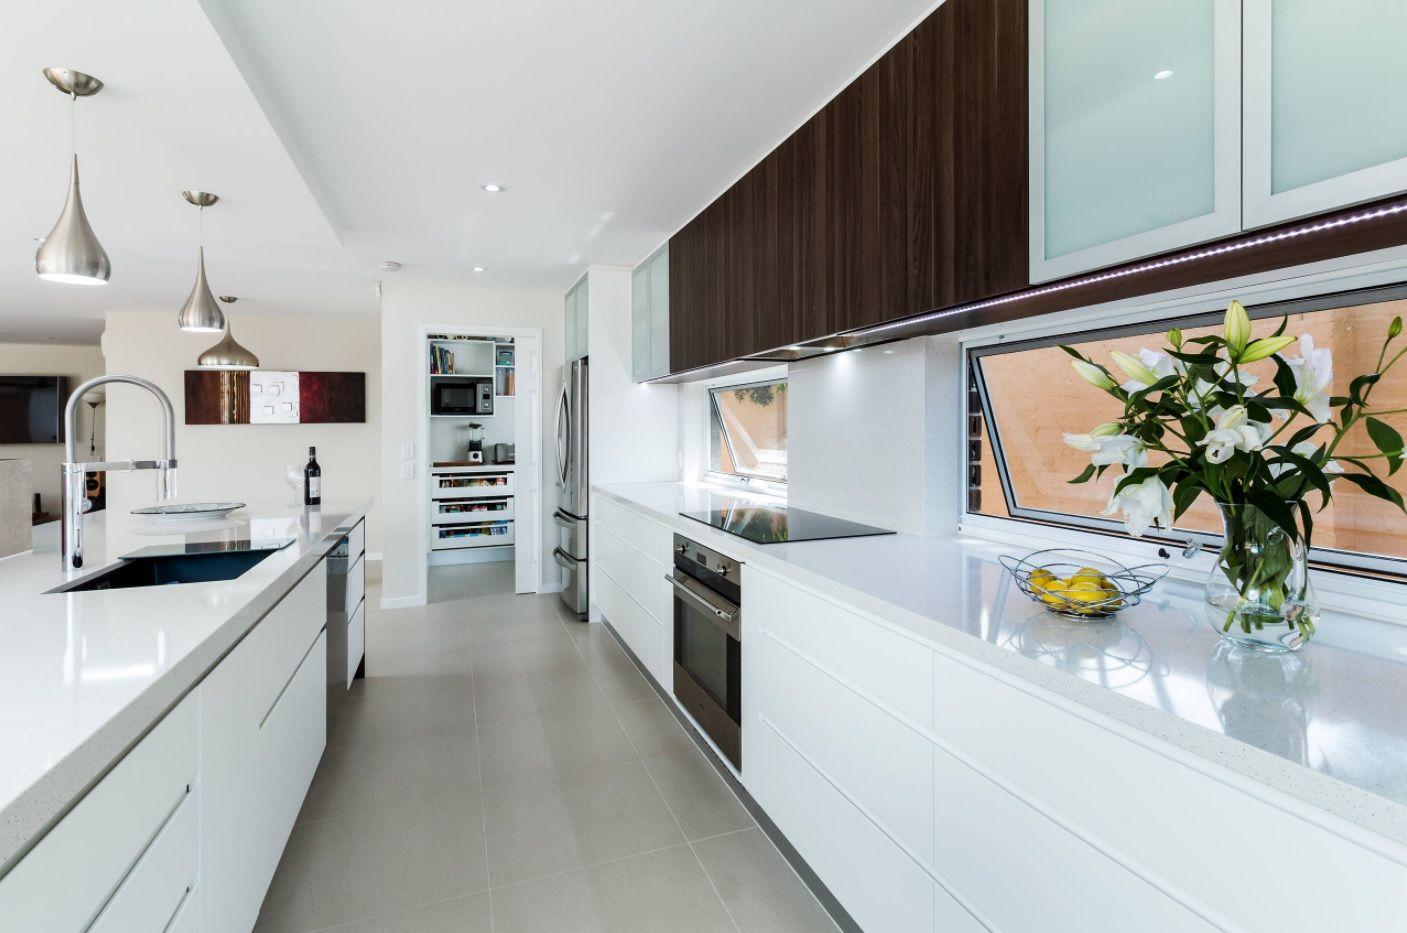 Open Kitchen Design & Interior Decoration. White glossy hi-tech solution for galley kitchen